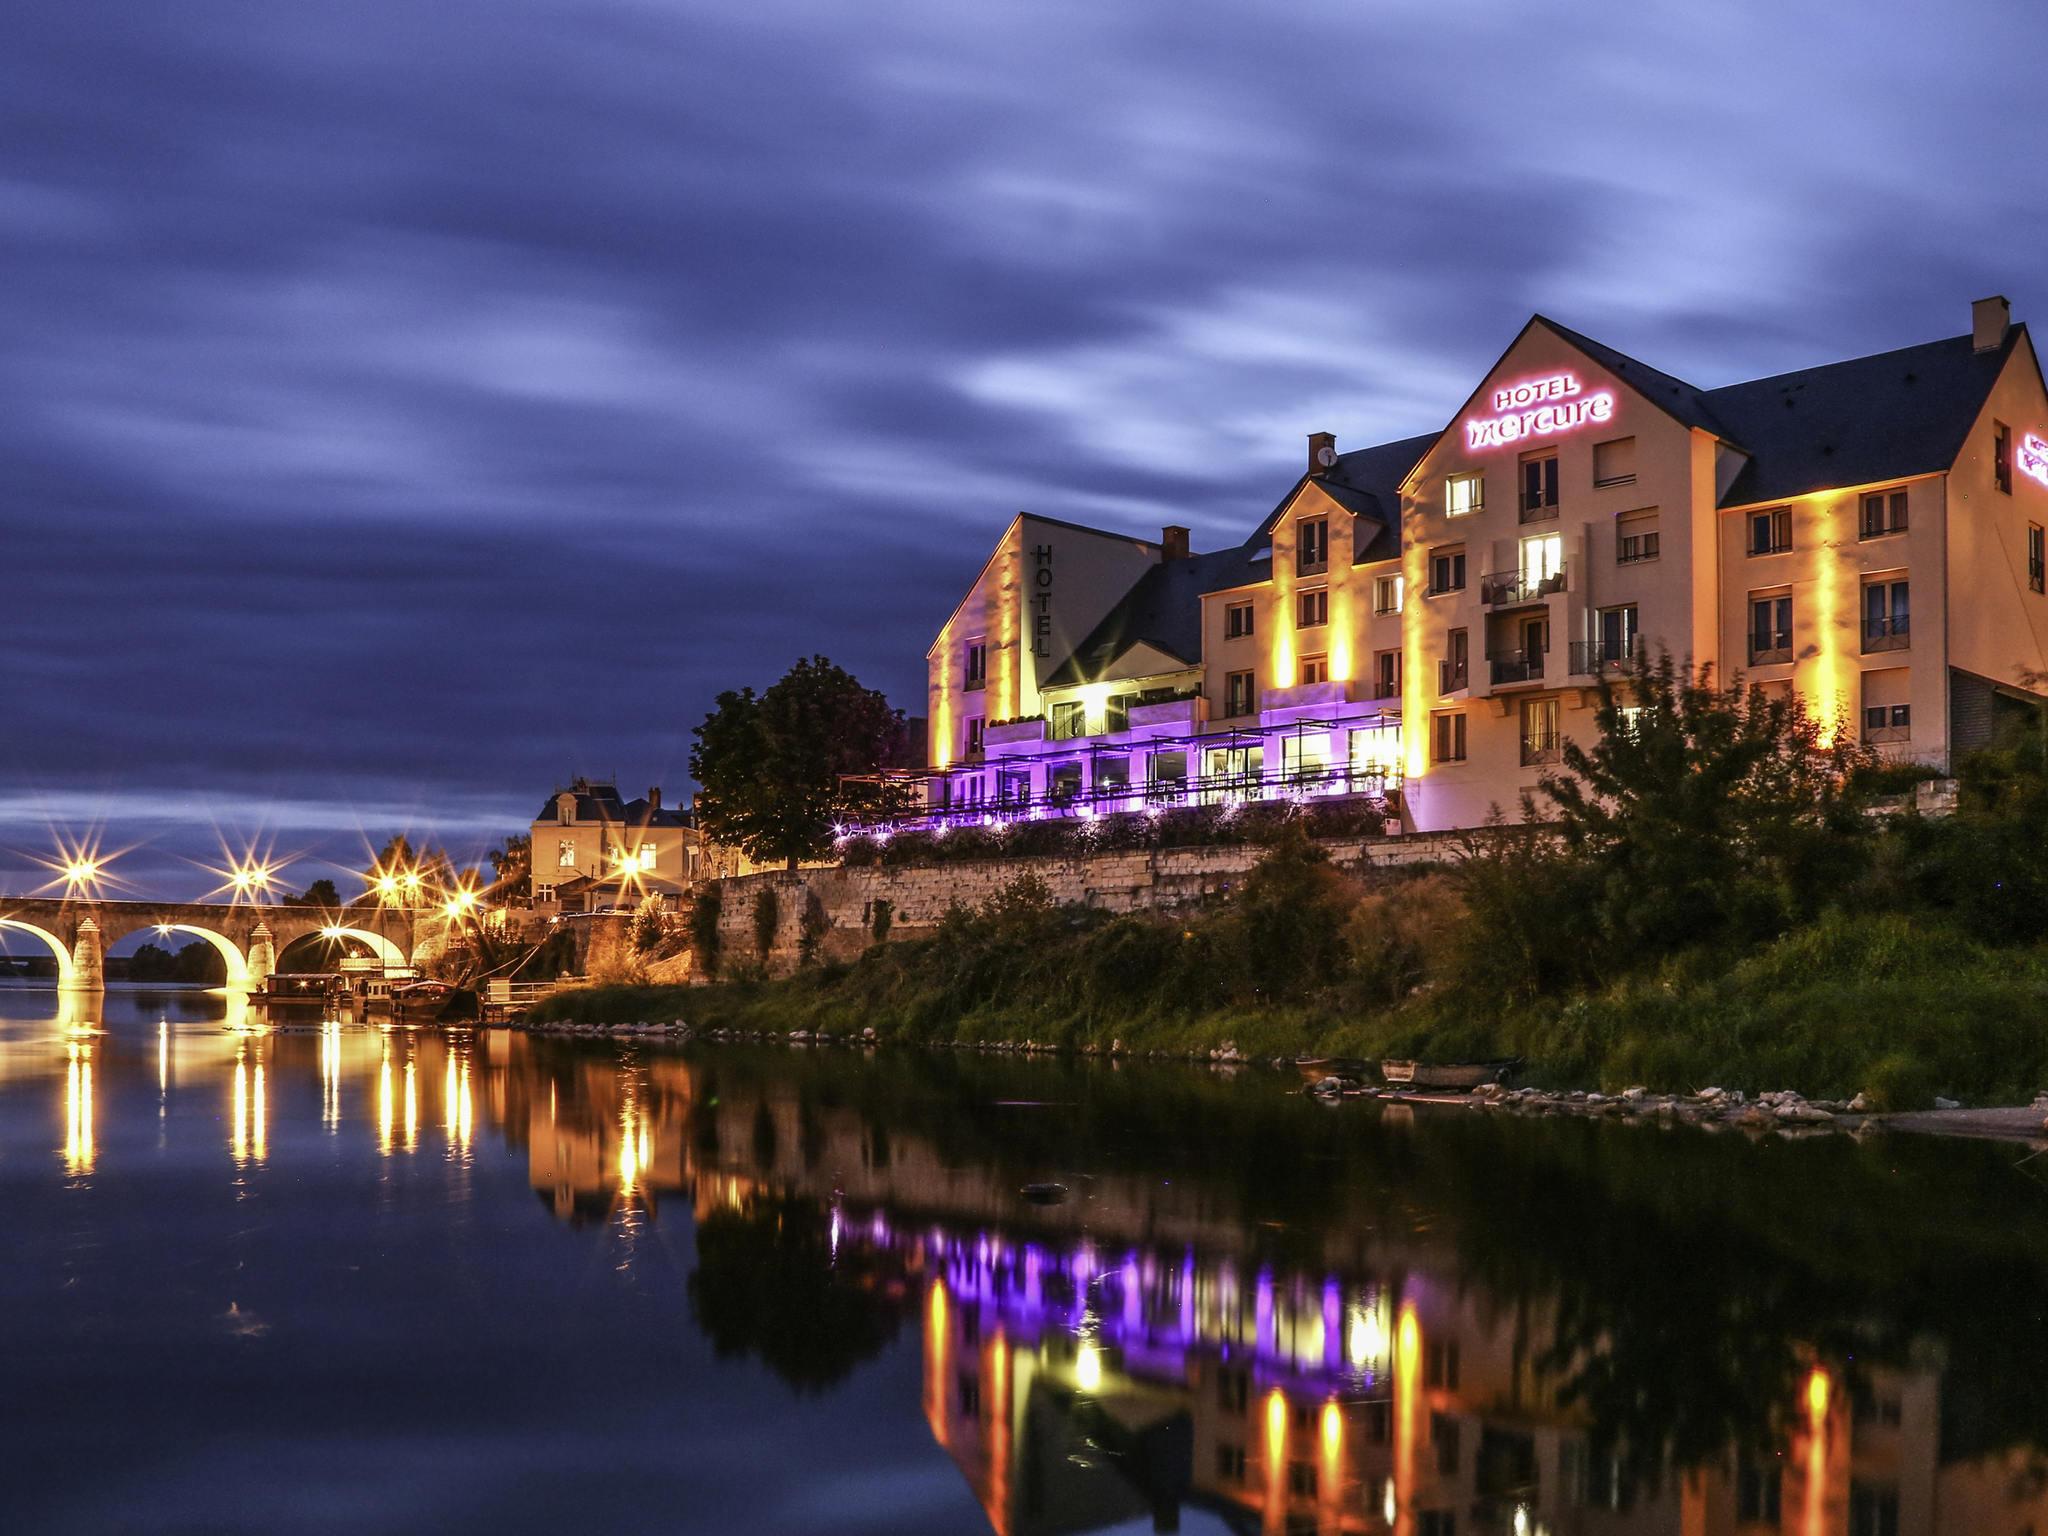 Hotel - Mercure Bords de Loire Saumur Hotel